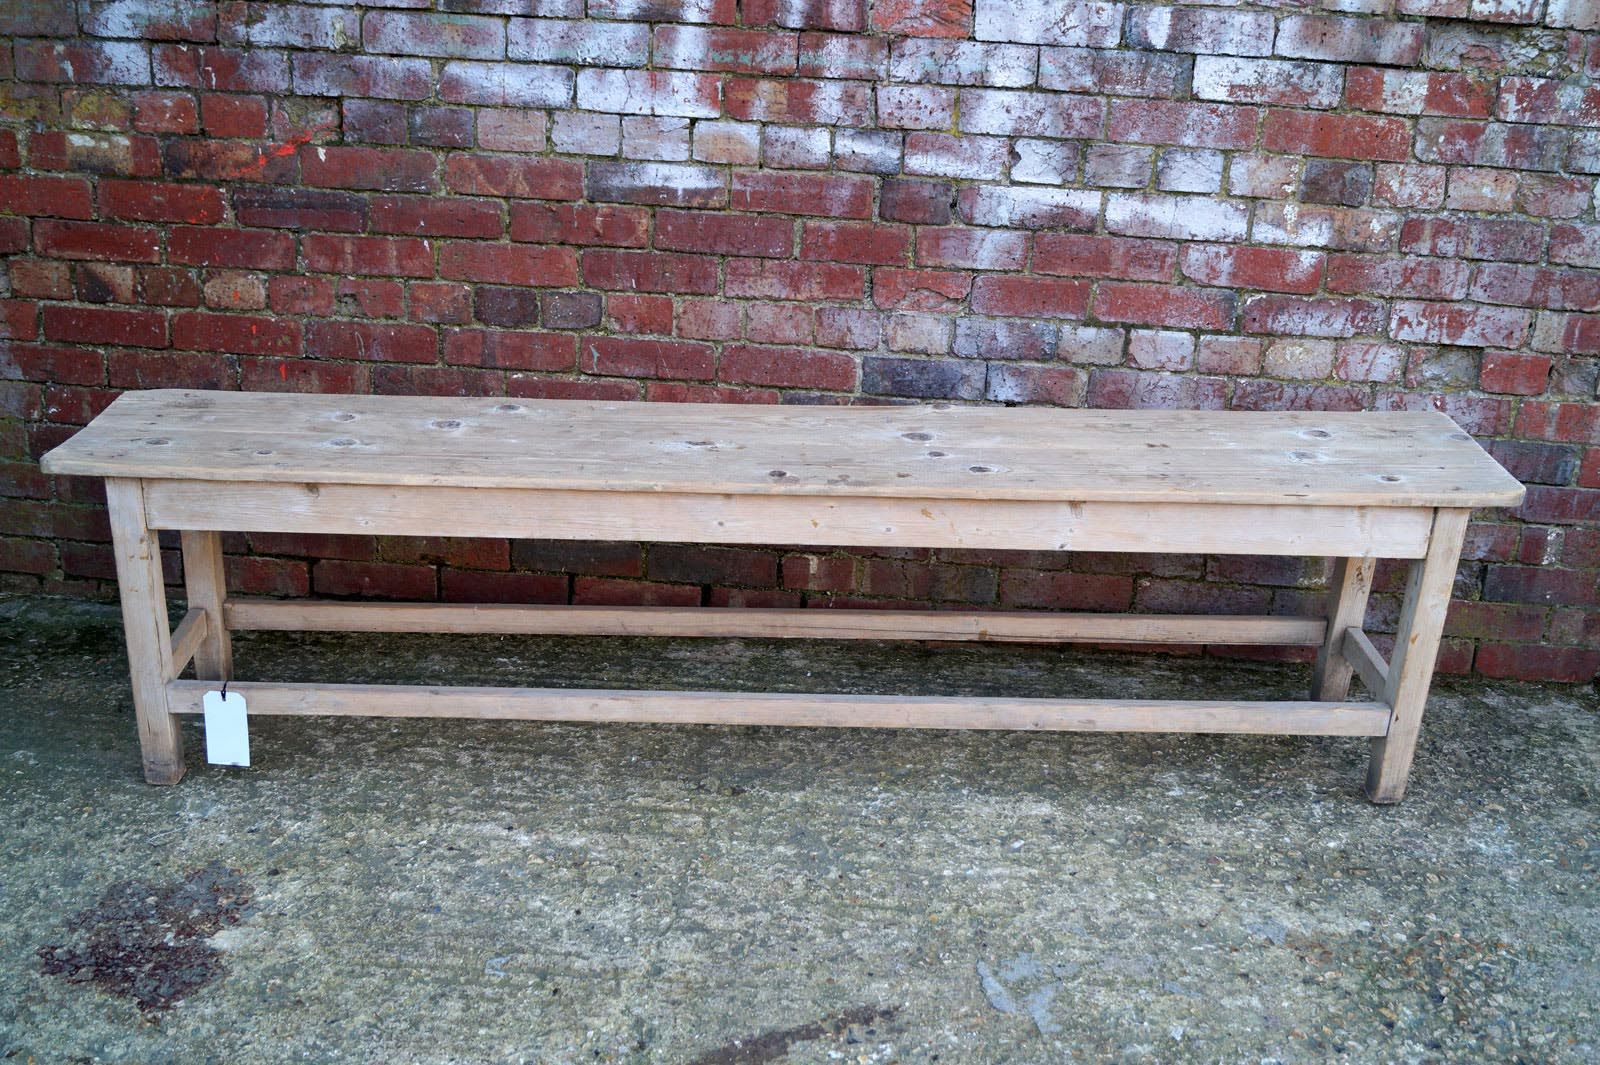 Antique Wooden Bench Antique Wooden Bench78